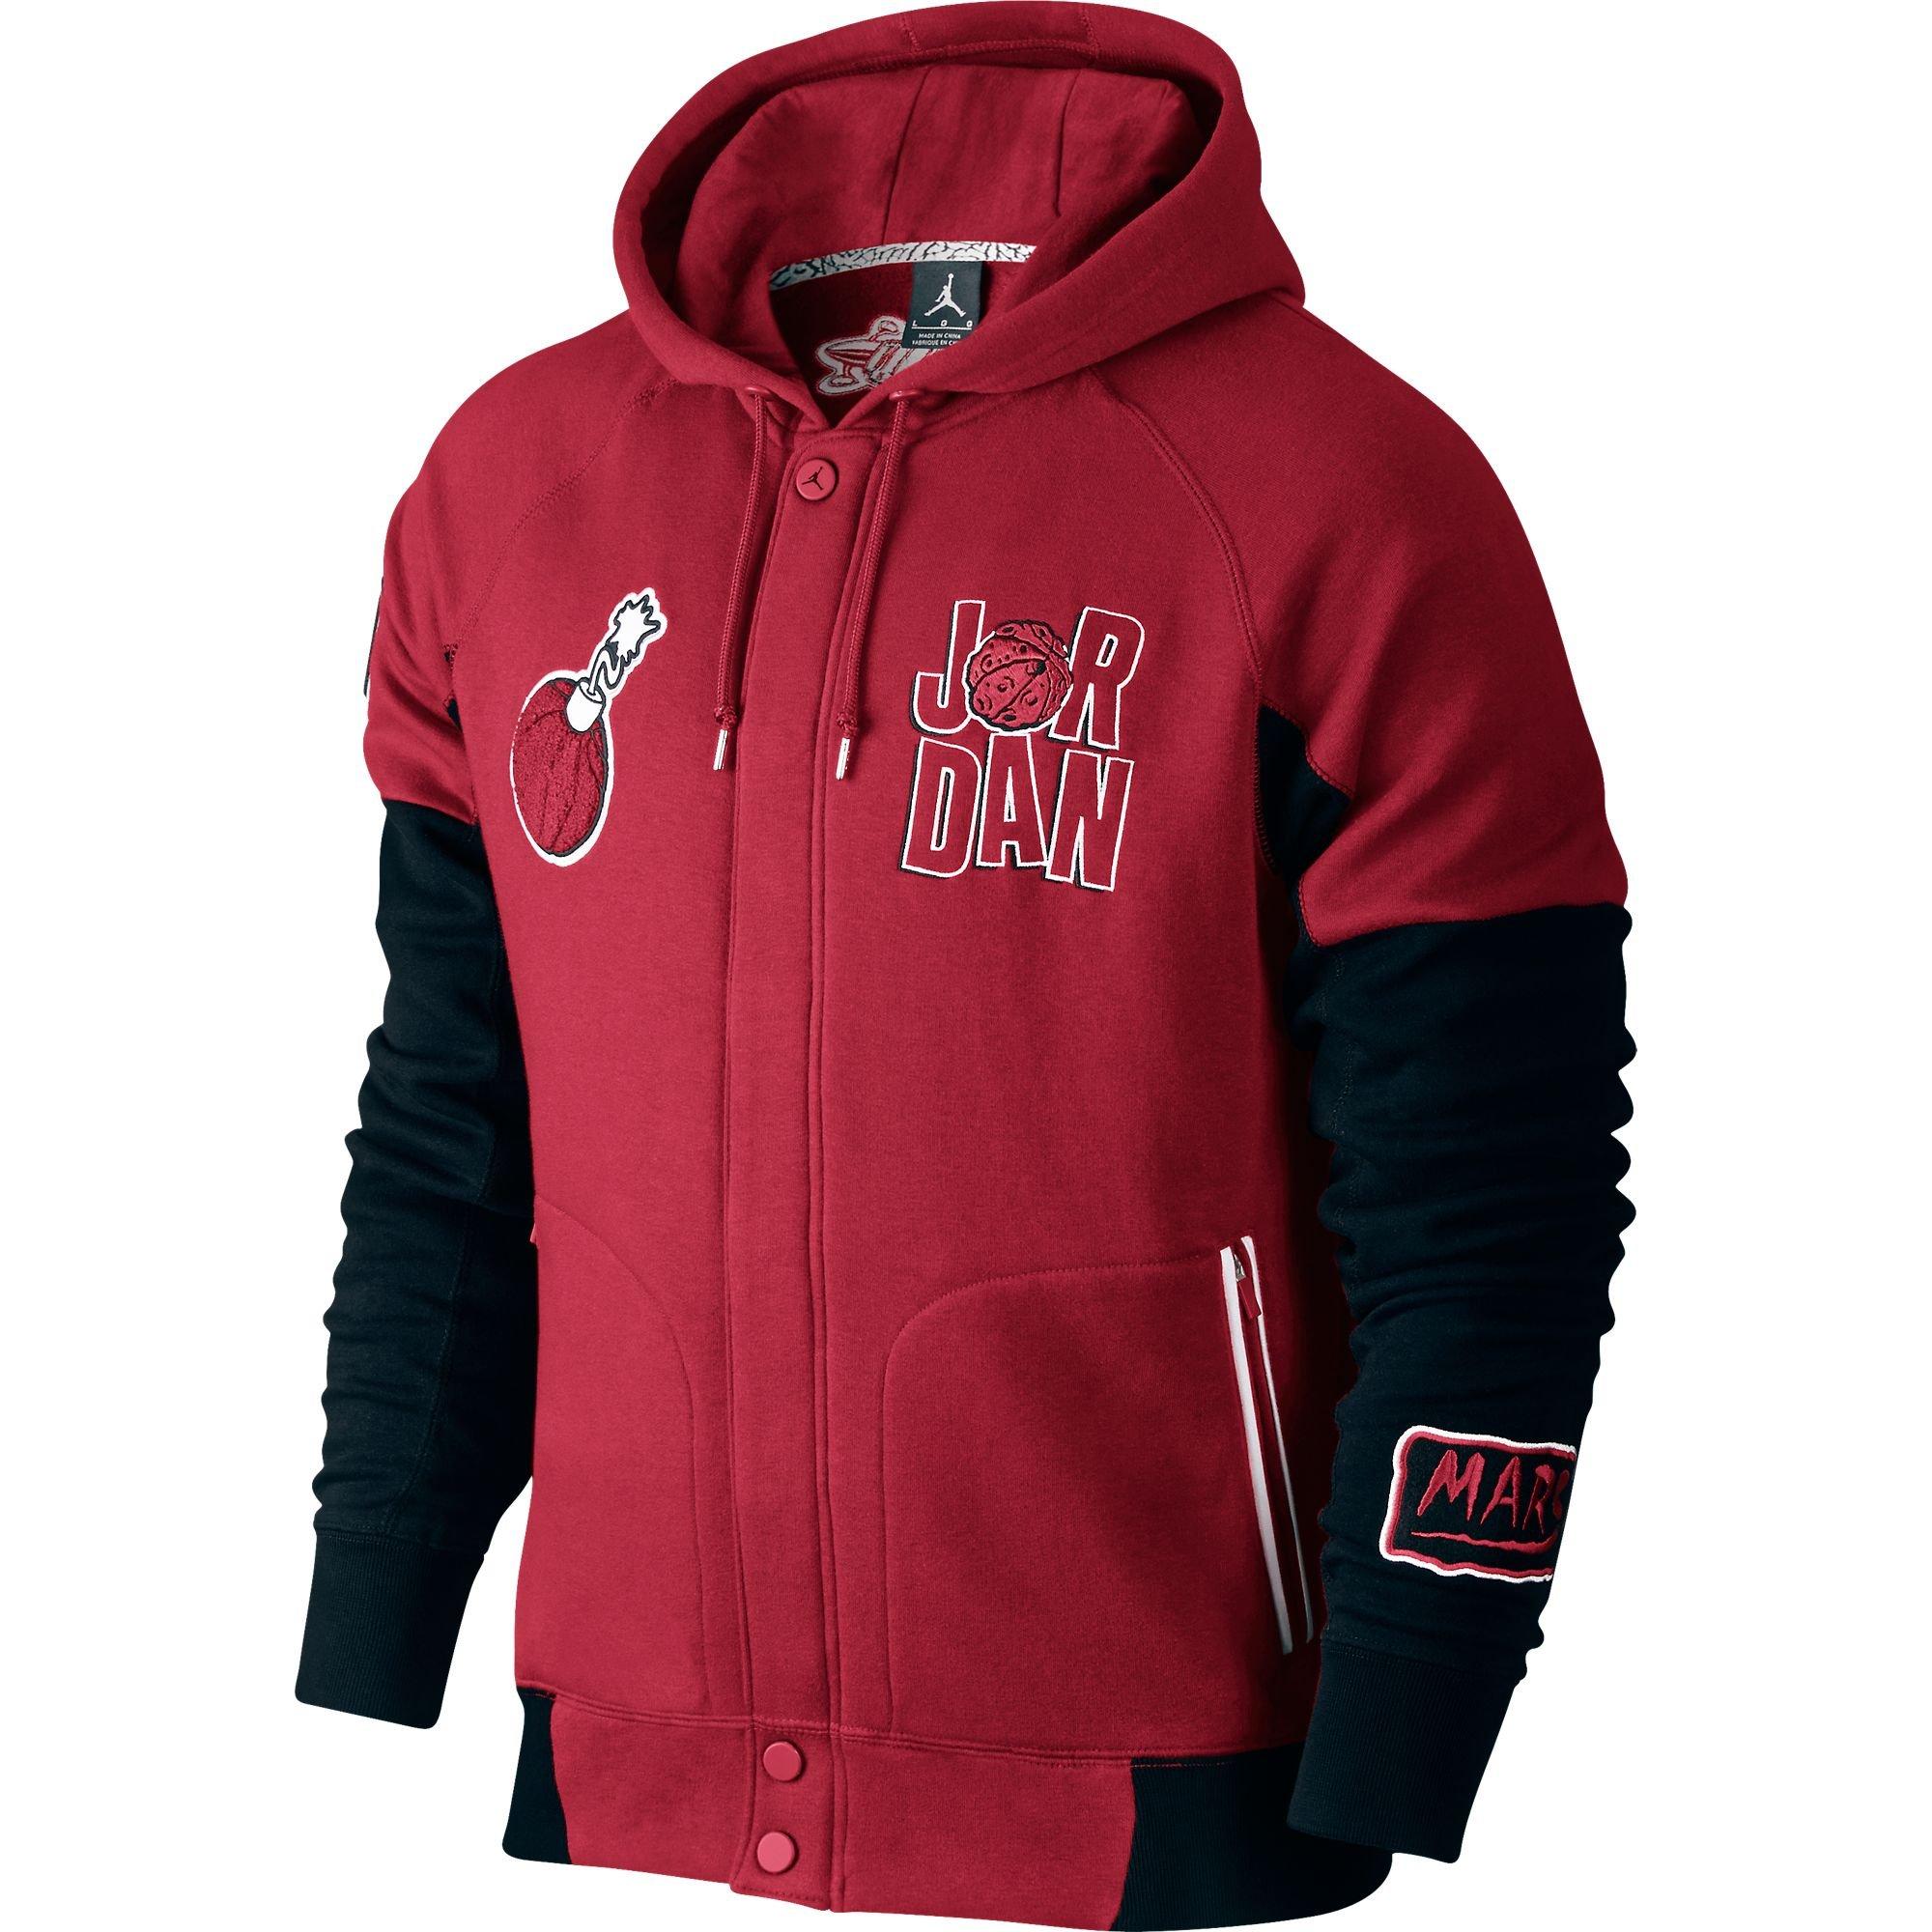 Jordan WB Marvin Varsity Hooded Men's Jacket Red/White/Black 716423-687 (Size 4X) by Jordan